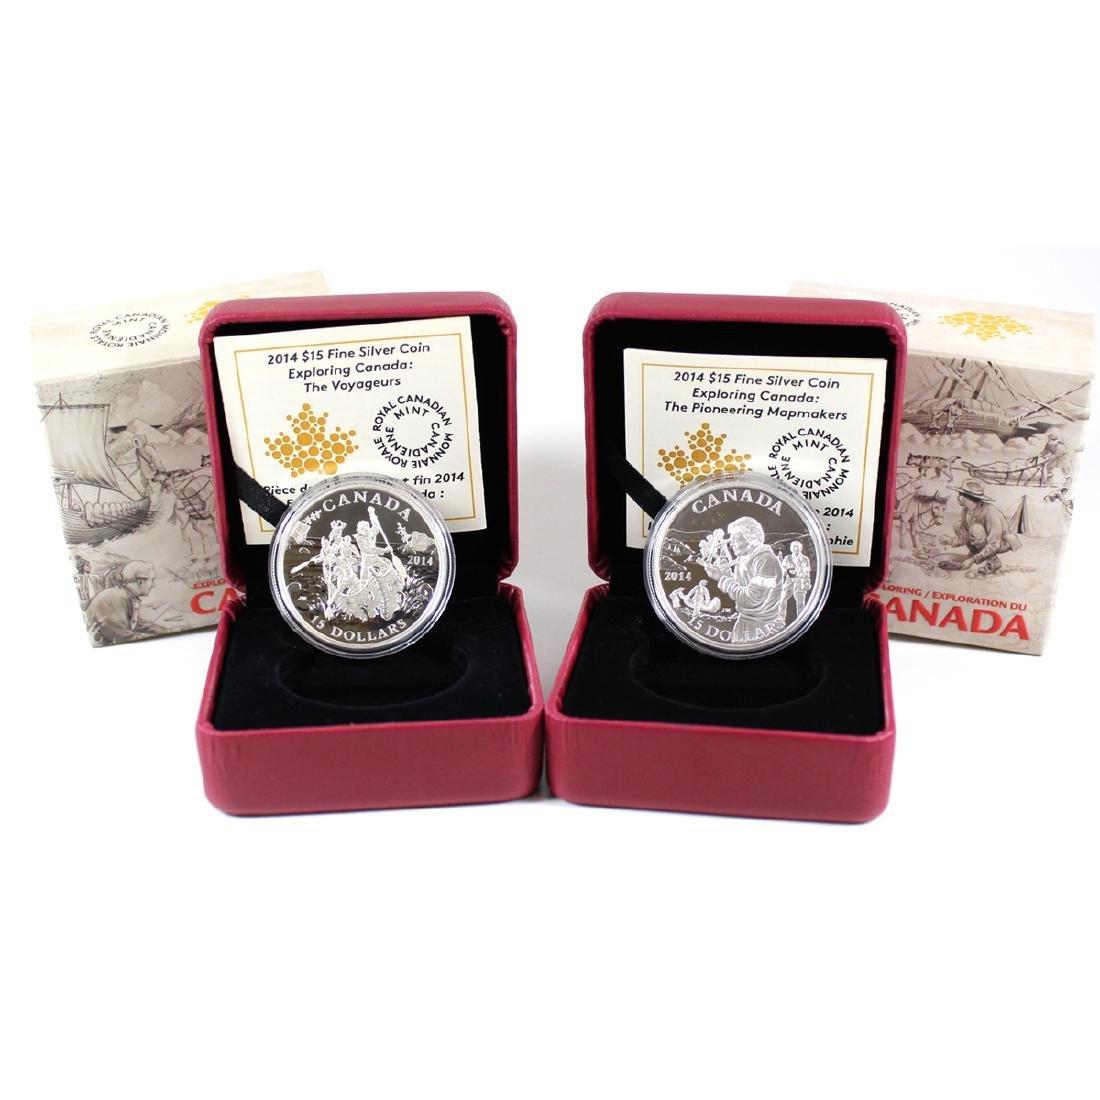 Pair of 2014 Canada $15 Exploring Canada Fine Silver